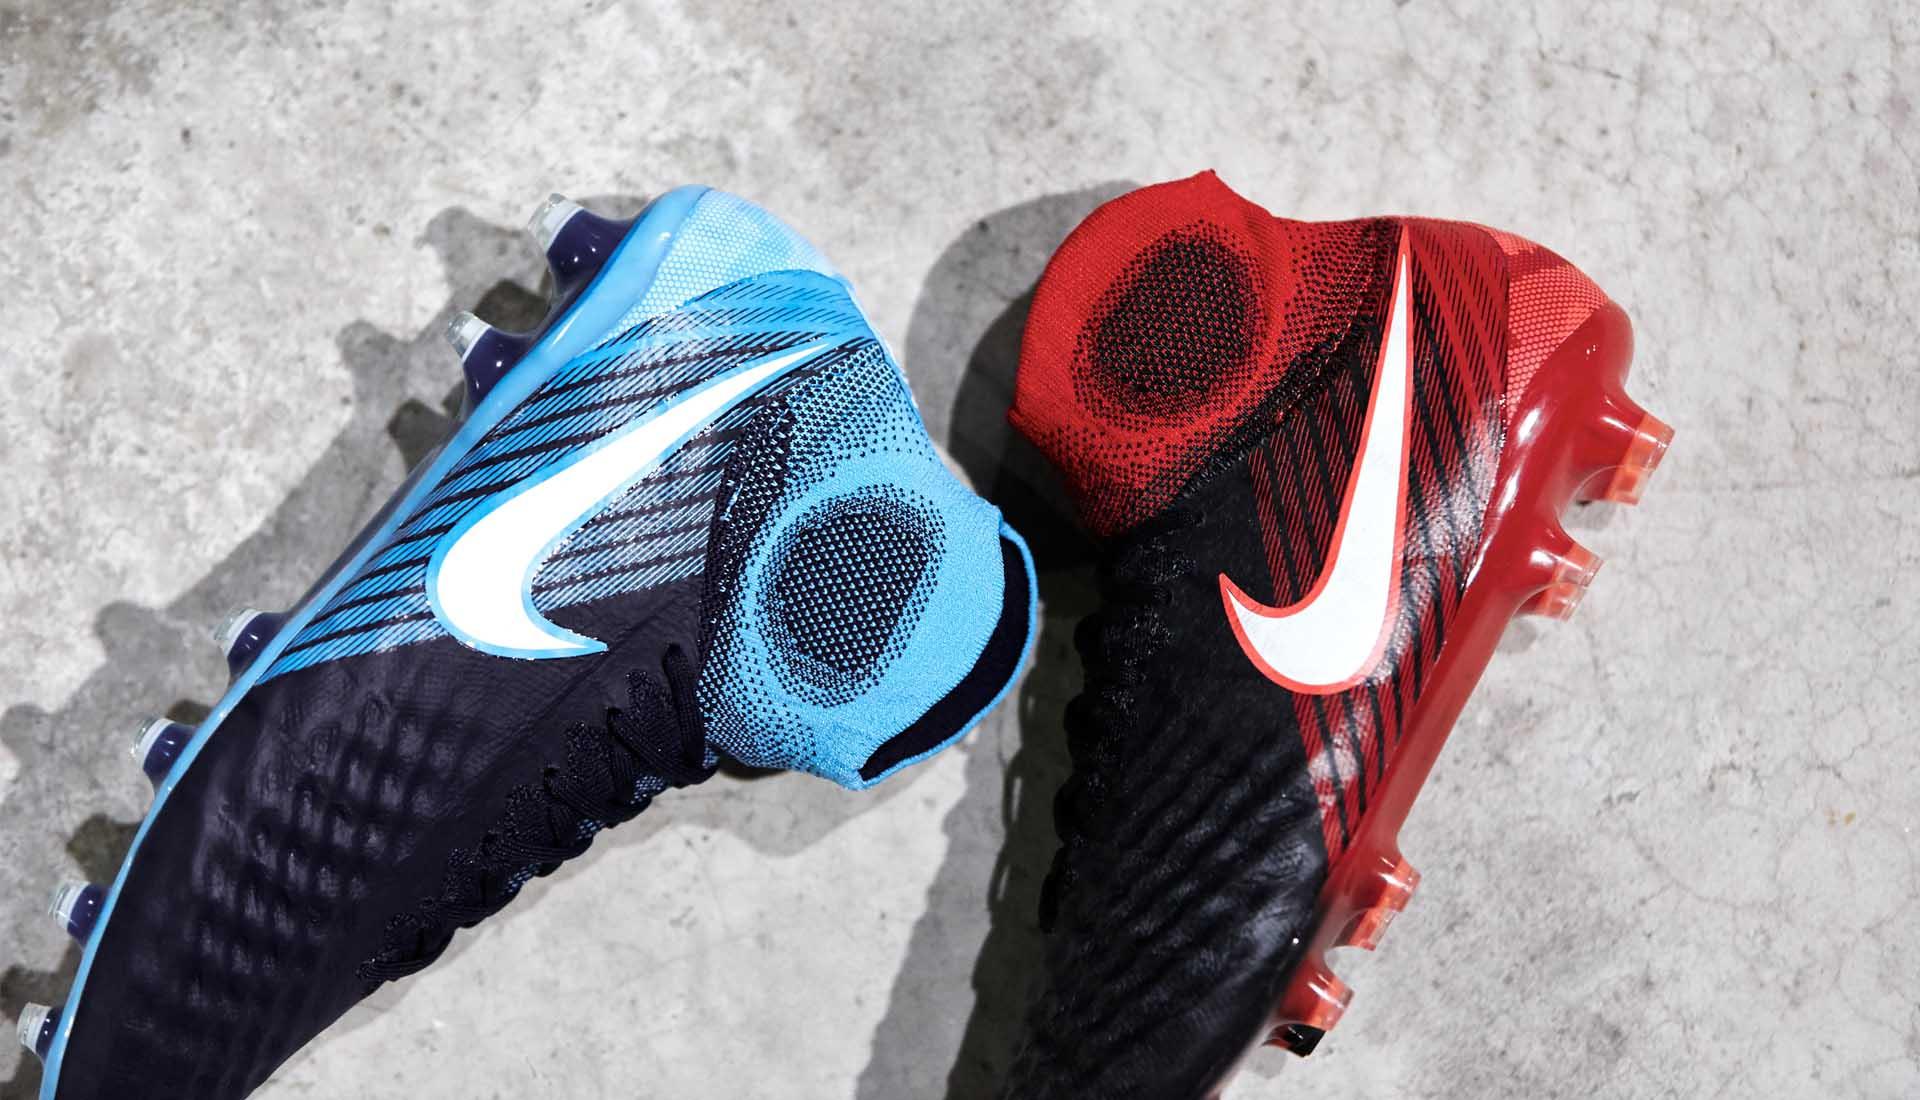 Nike Launch the Fire \u0026 Ice Football